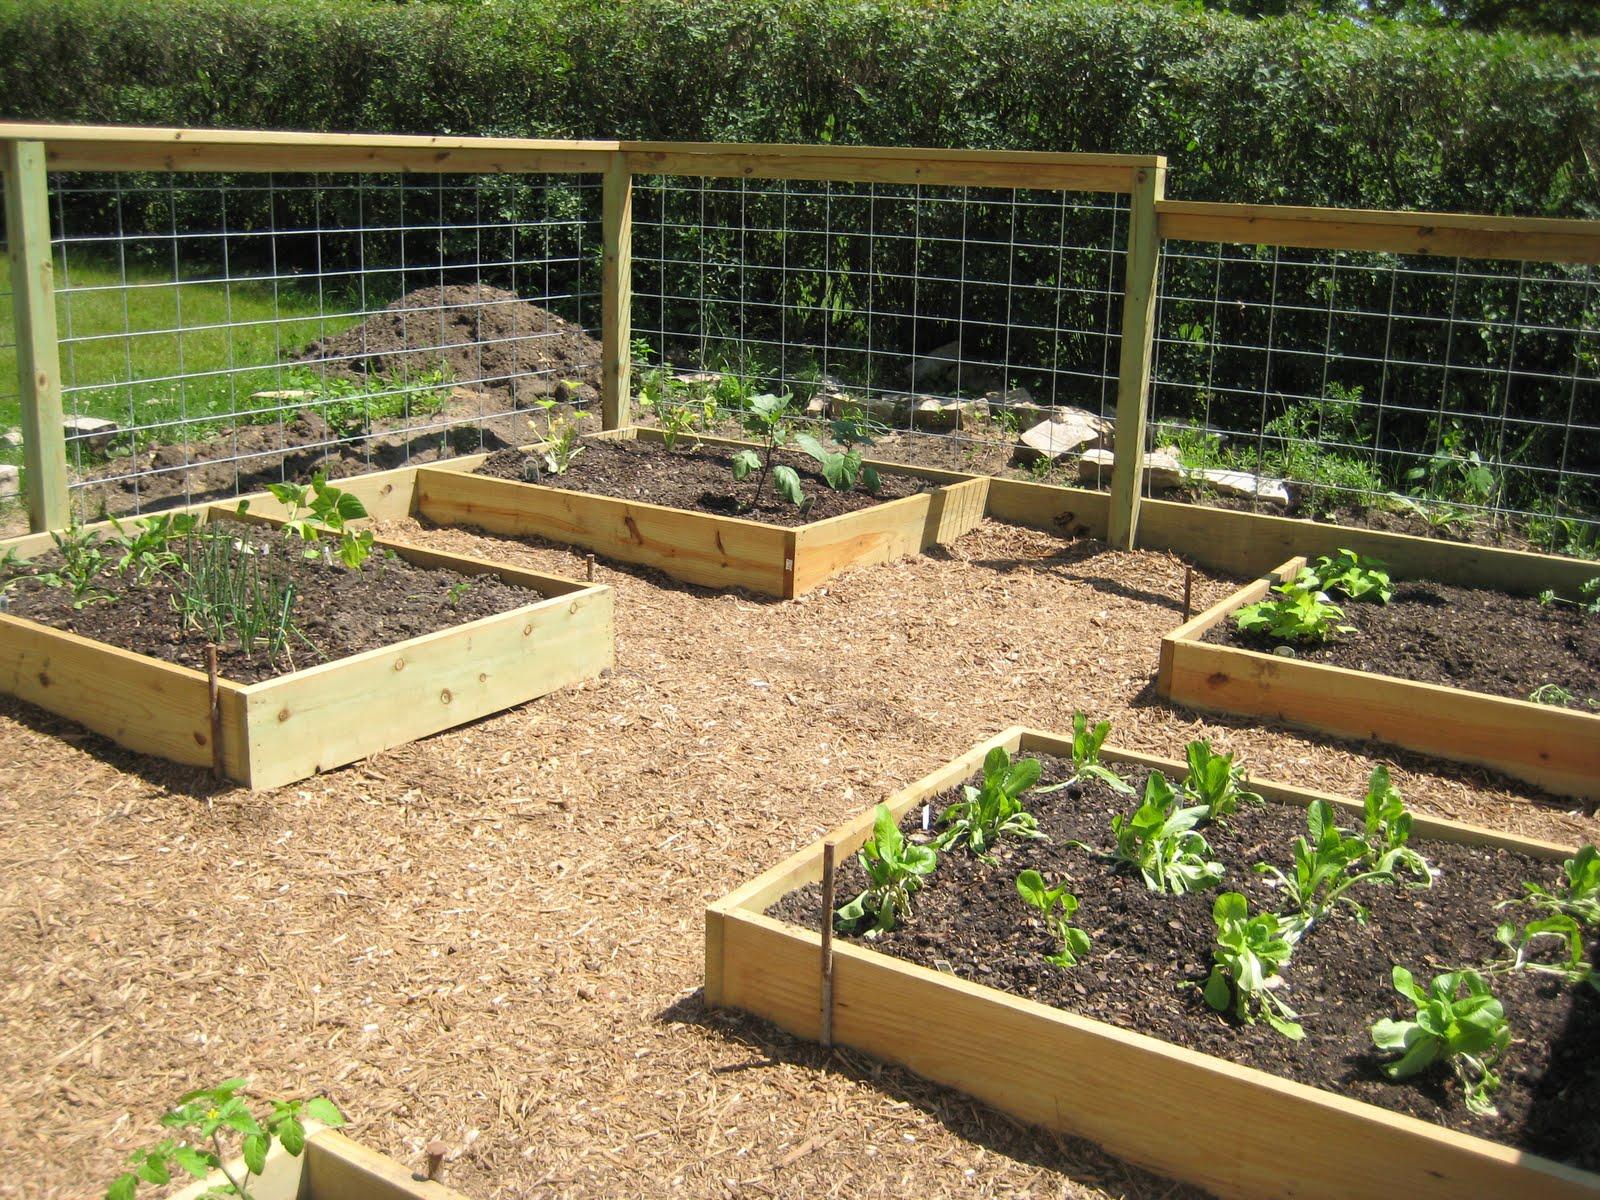 Gardens Raised: GlasderBuilding: Raised Bed Gardening: Beautiful And Organized